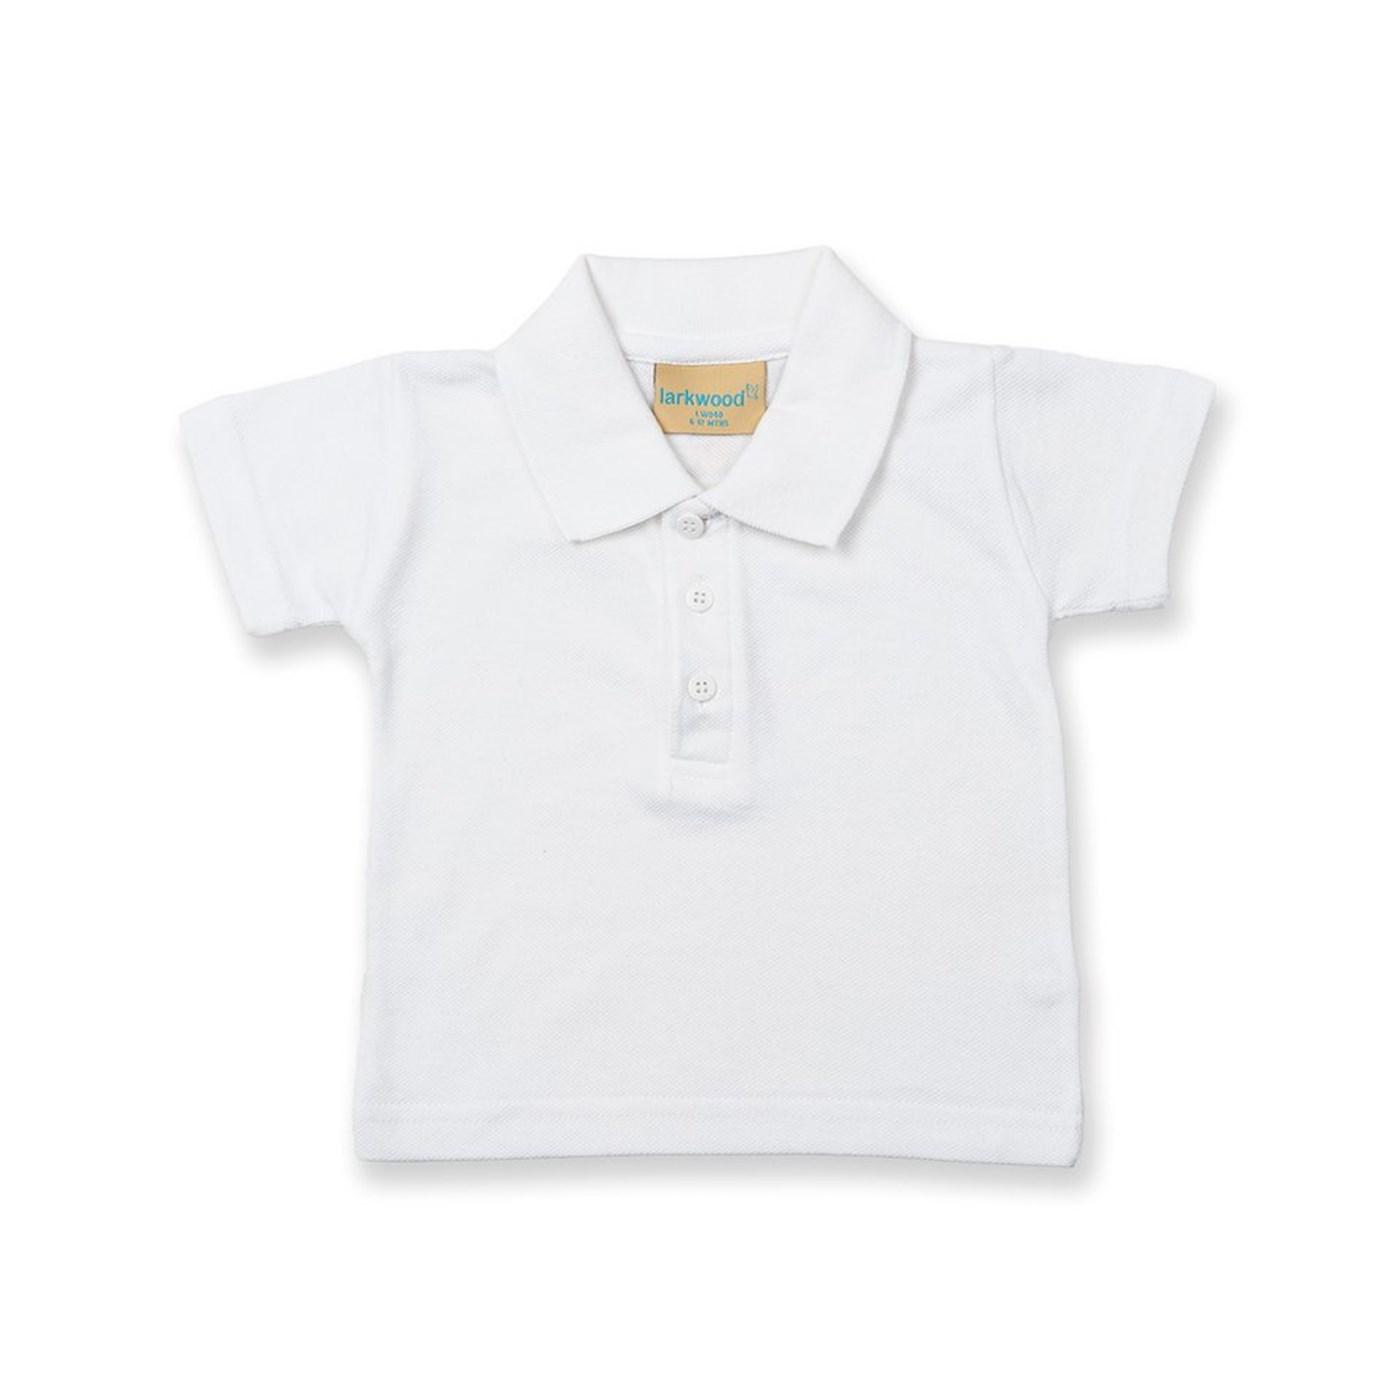 dd456b31b Baby/toddler polo shirt White. Loading zoom